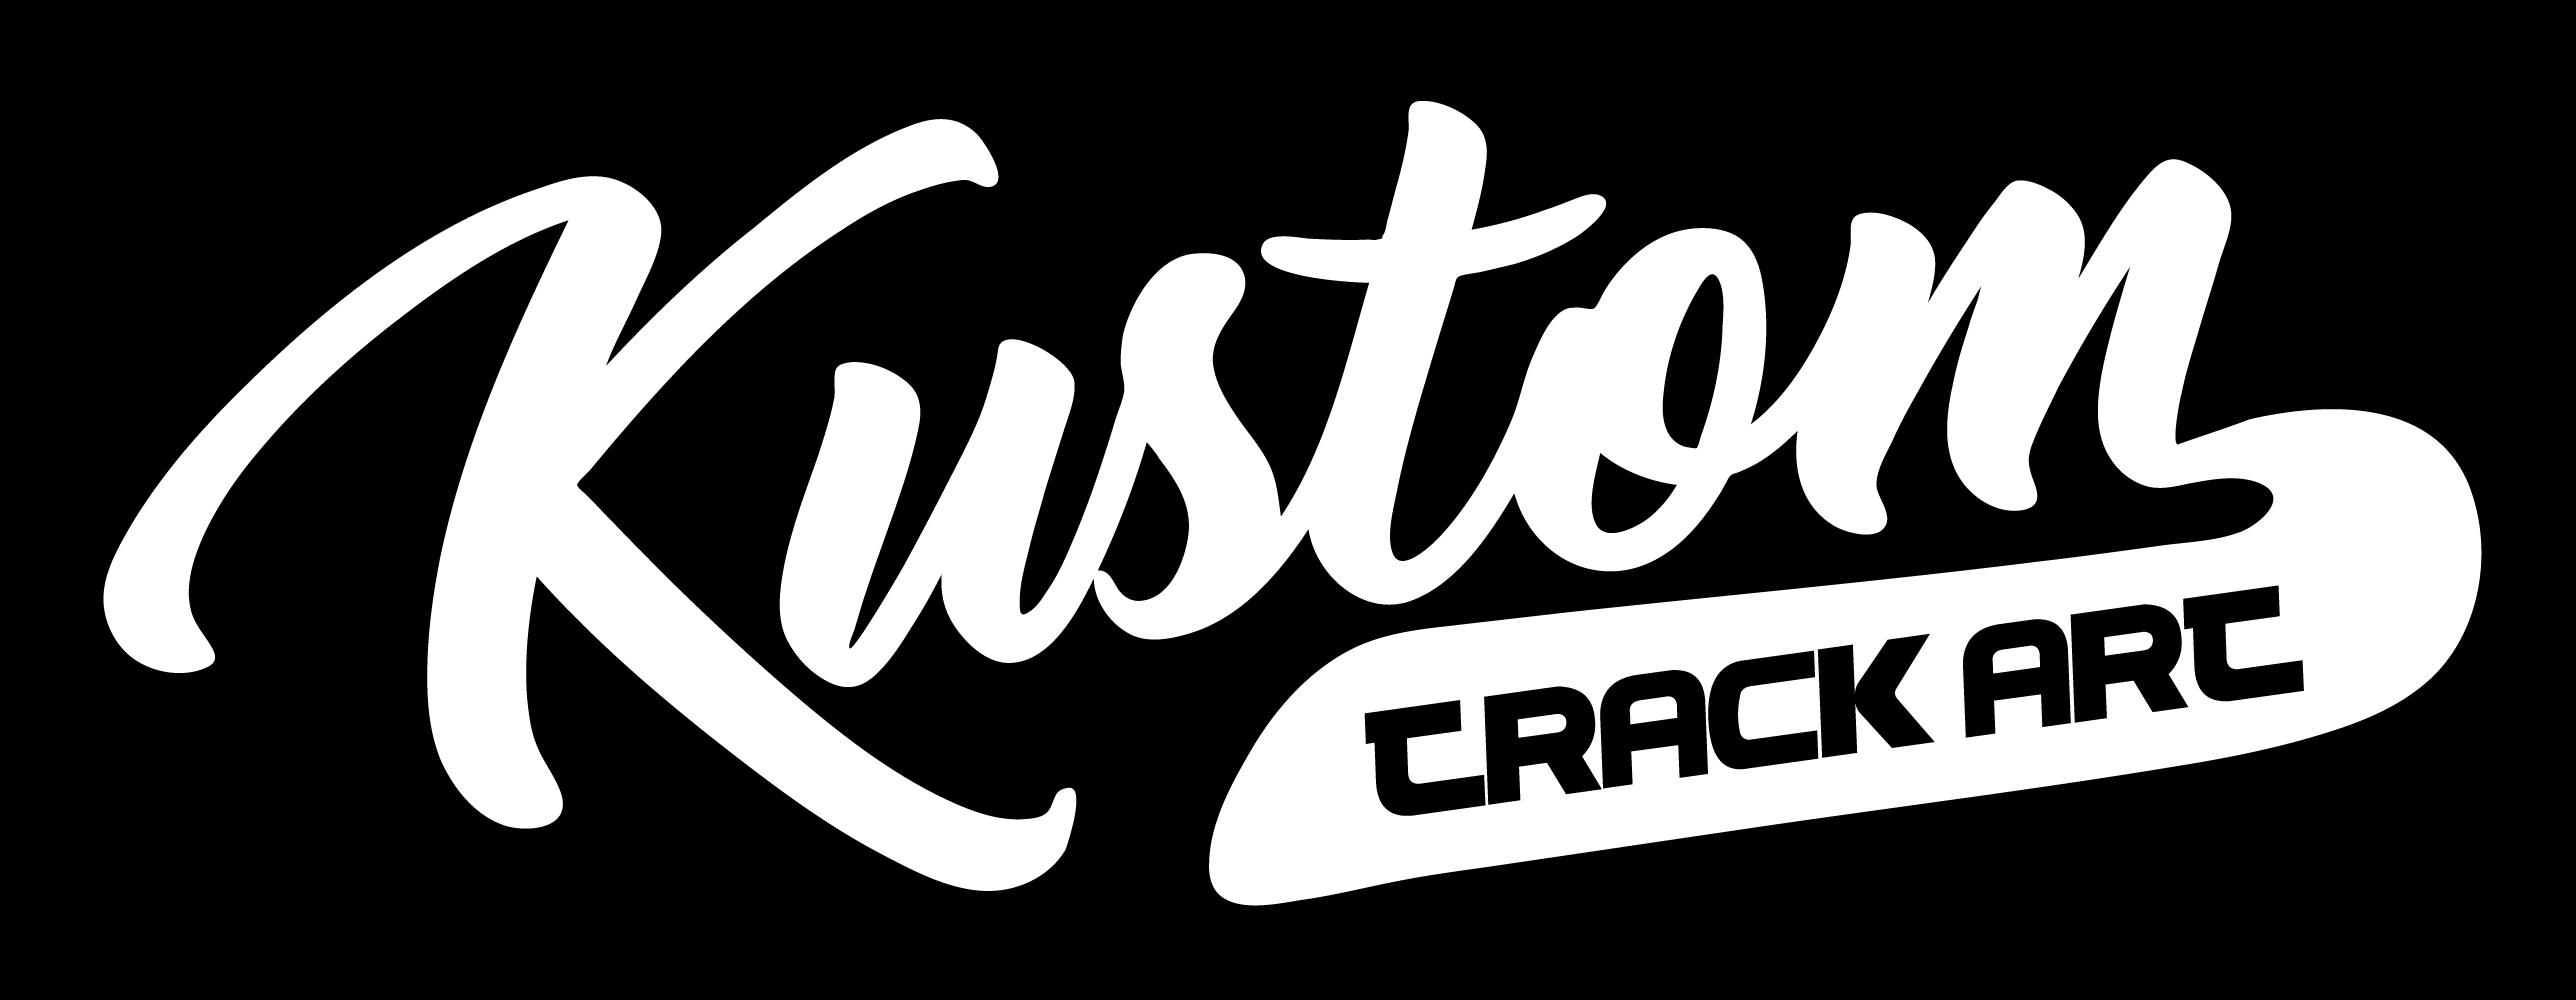 Kustom Track Art